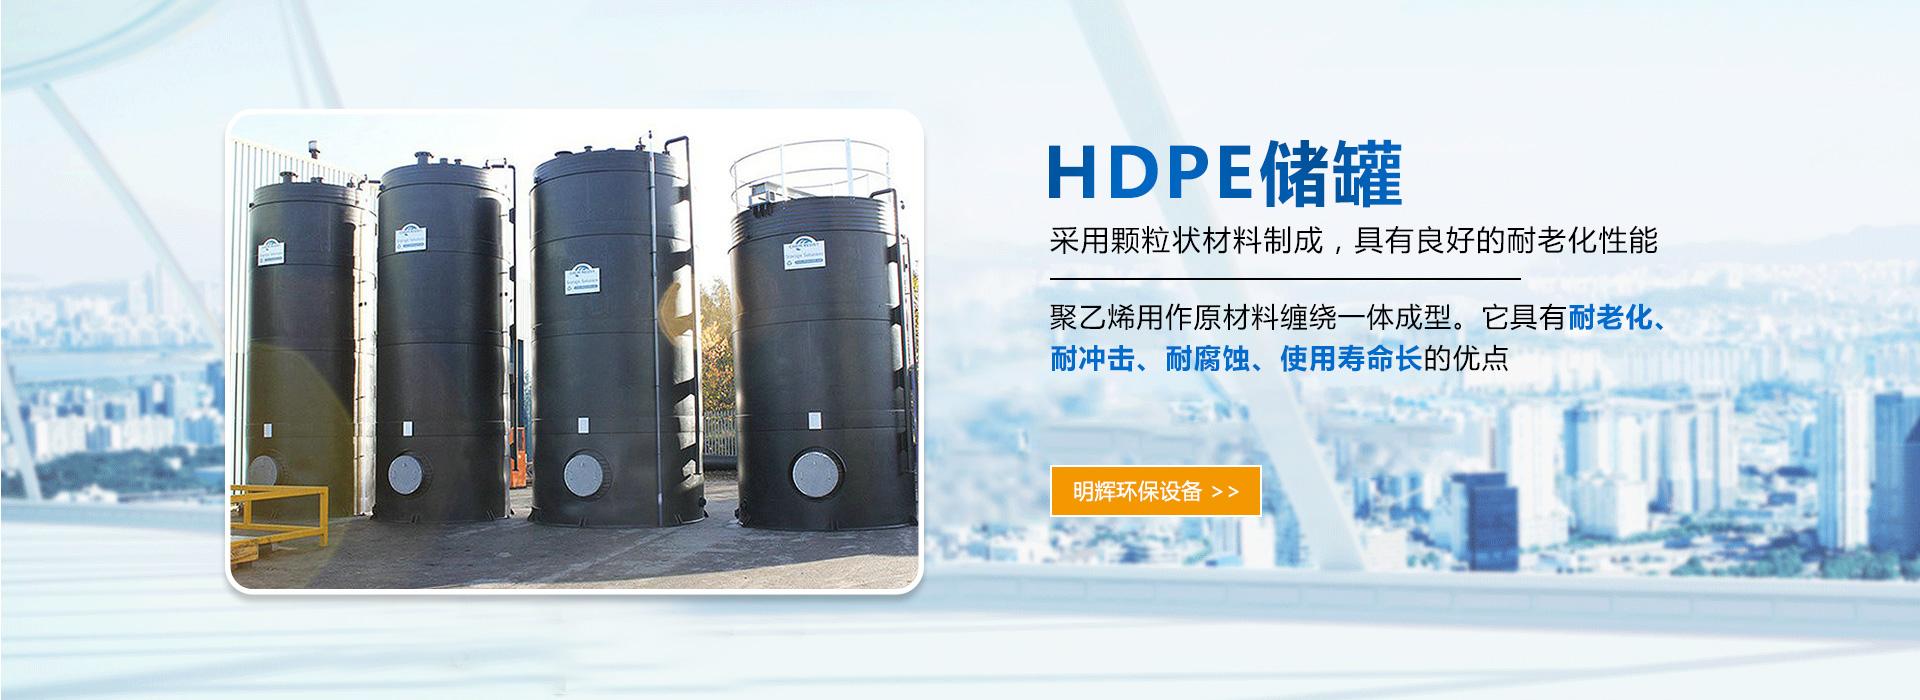 HDPE储罐